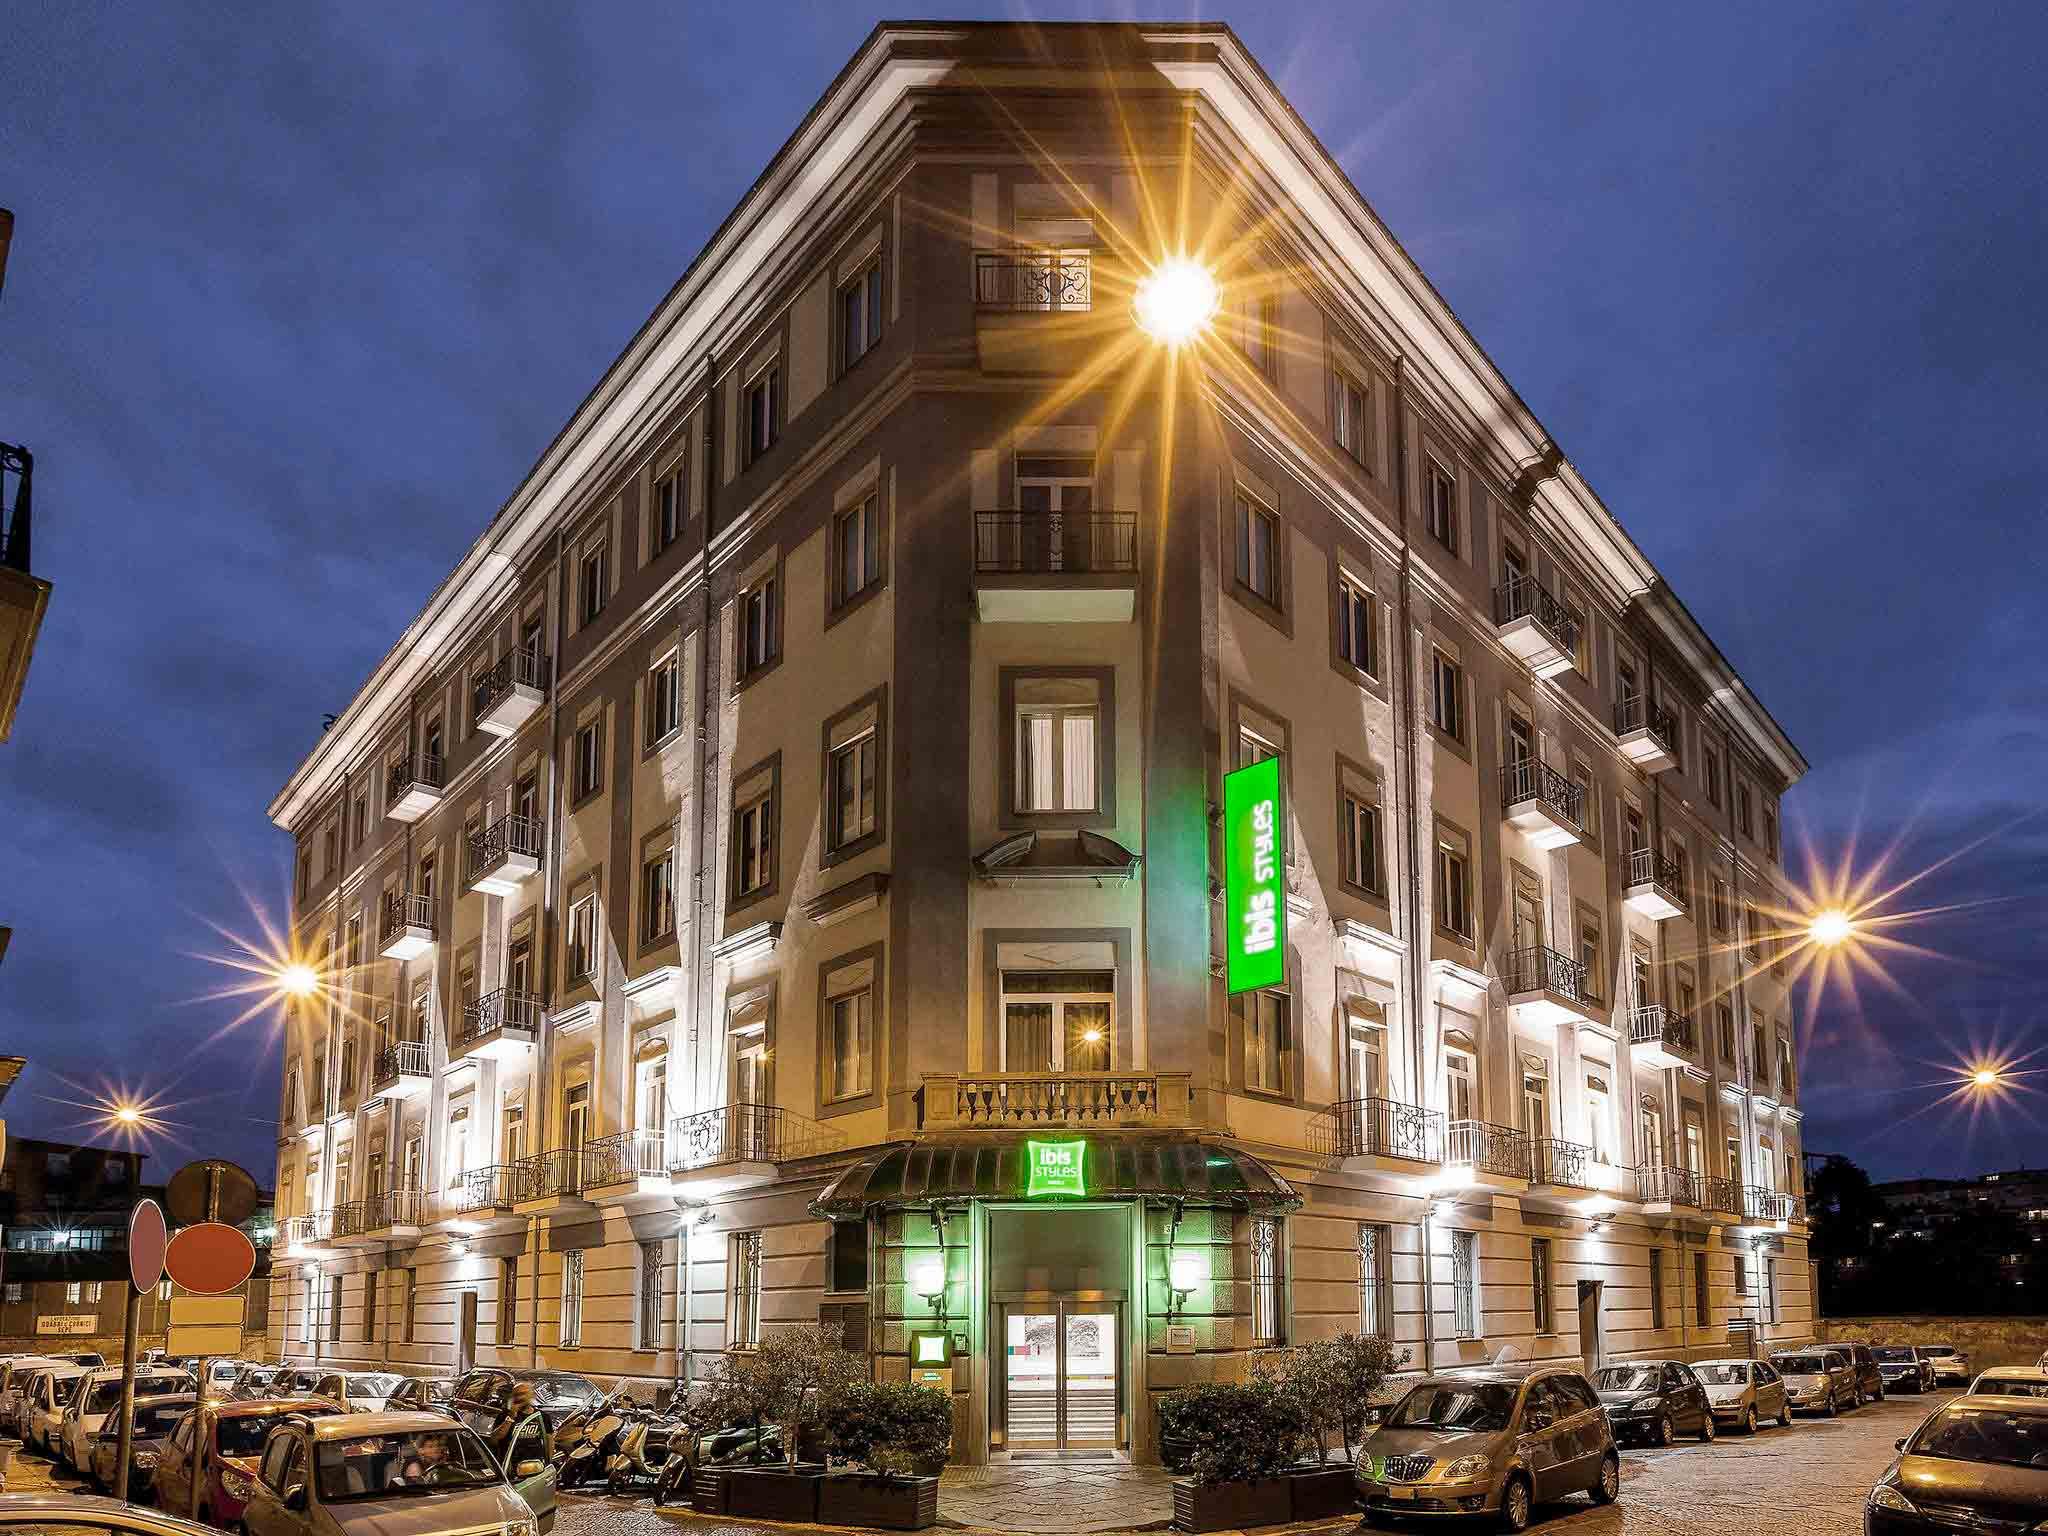 Hotell – ibis Styles Napoli Garibaldi